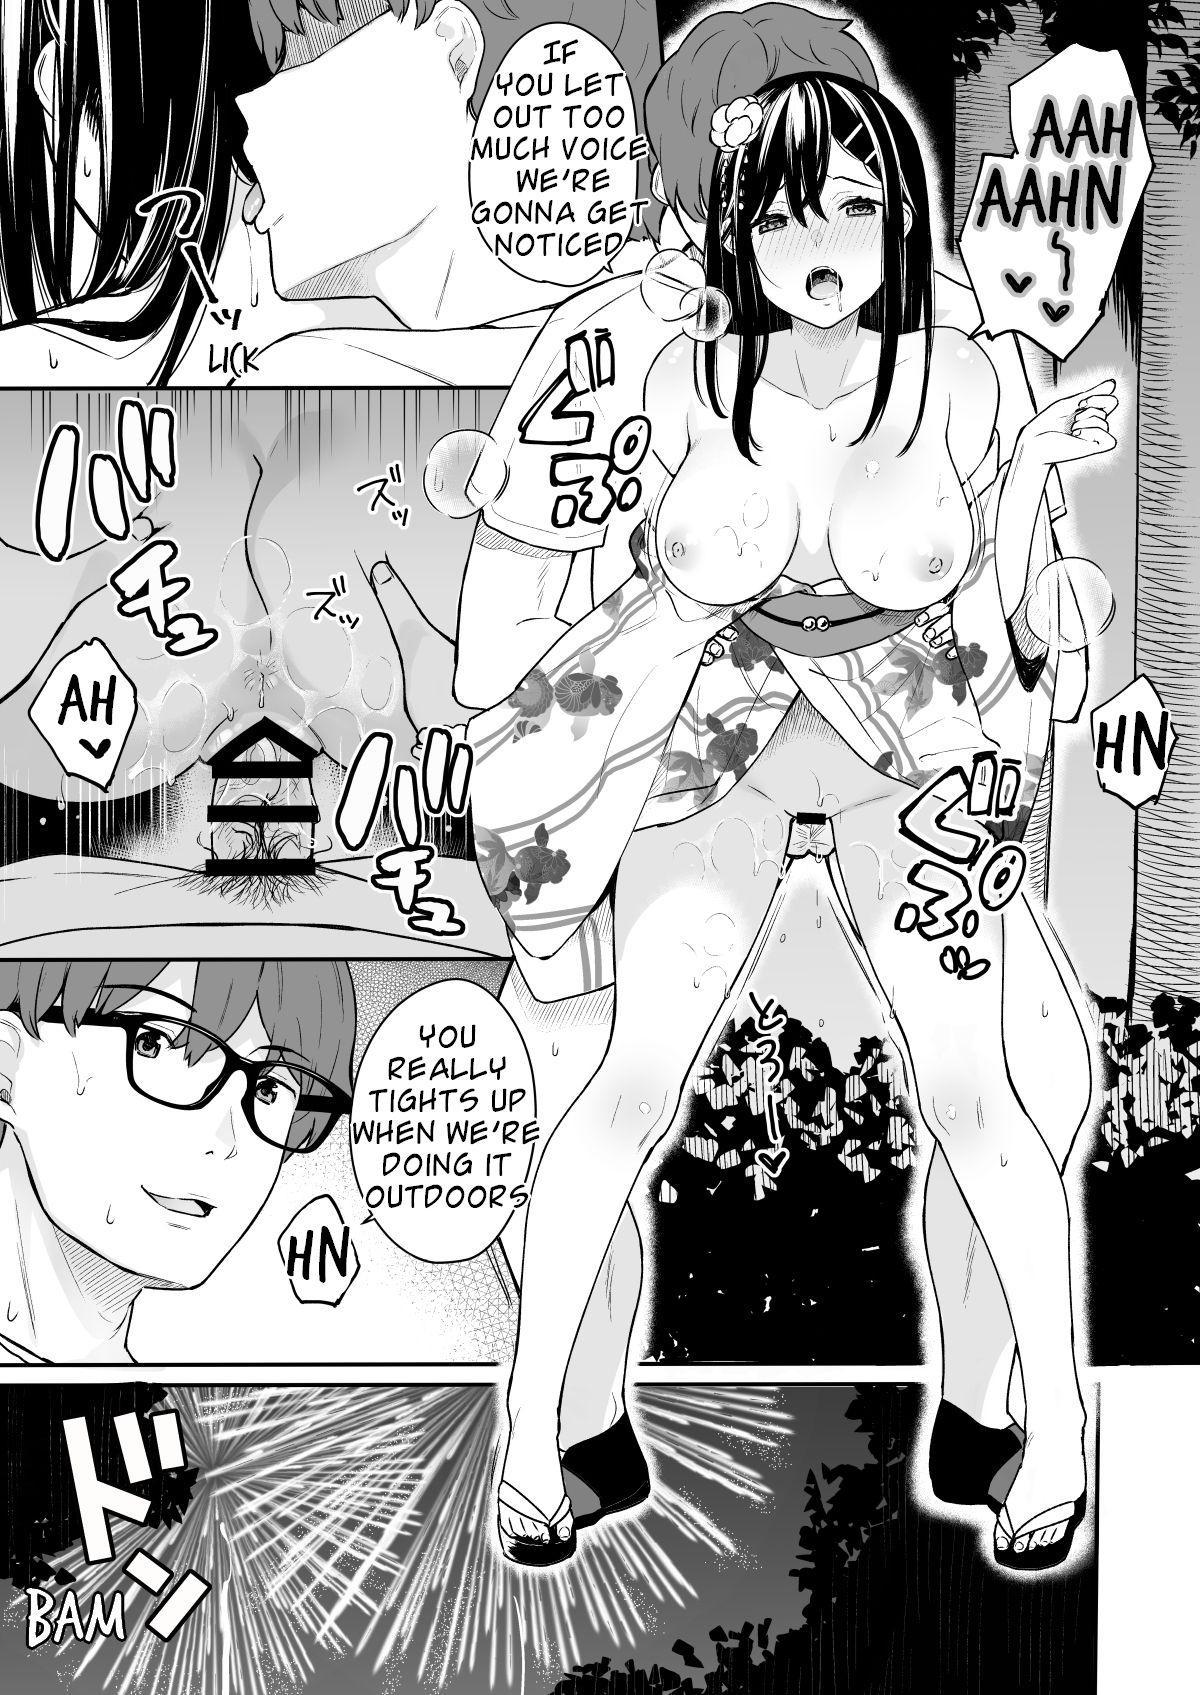 Itomusubi Vol. 3 7